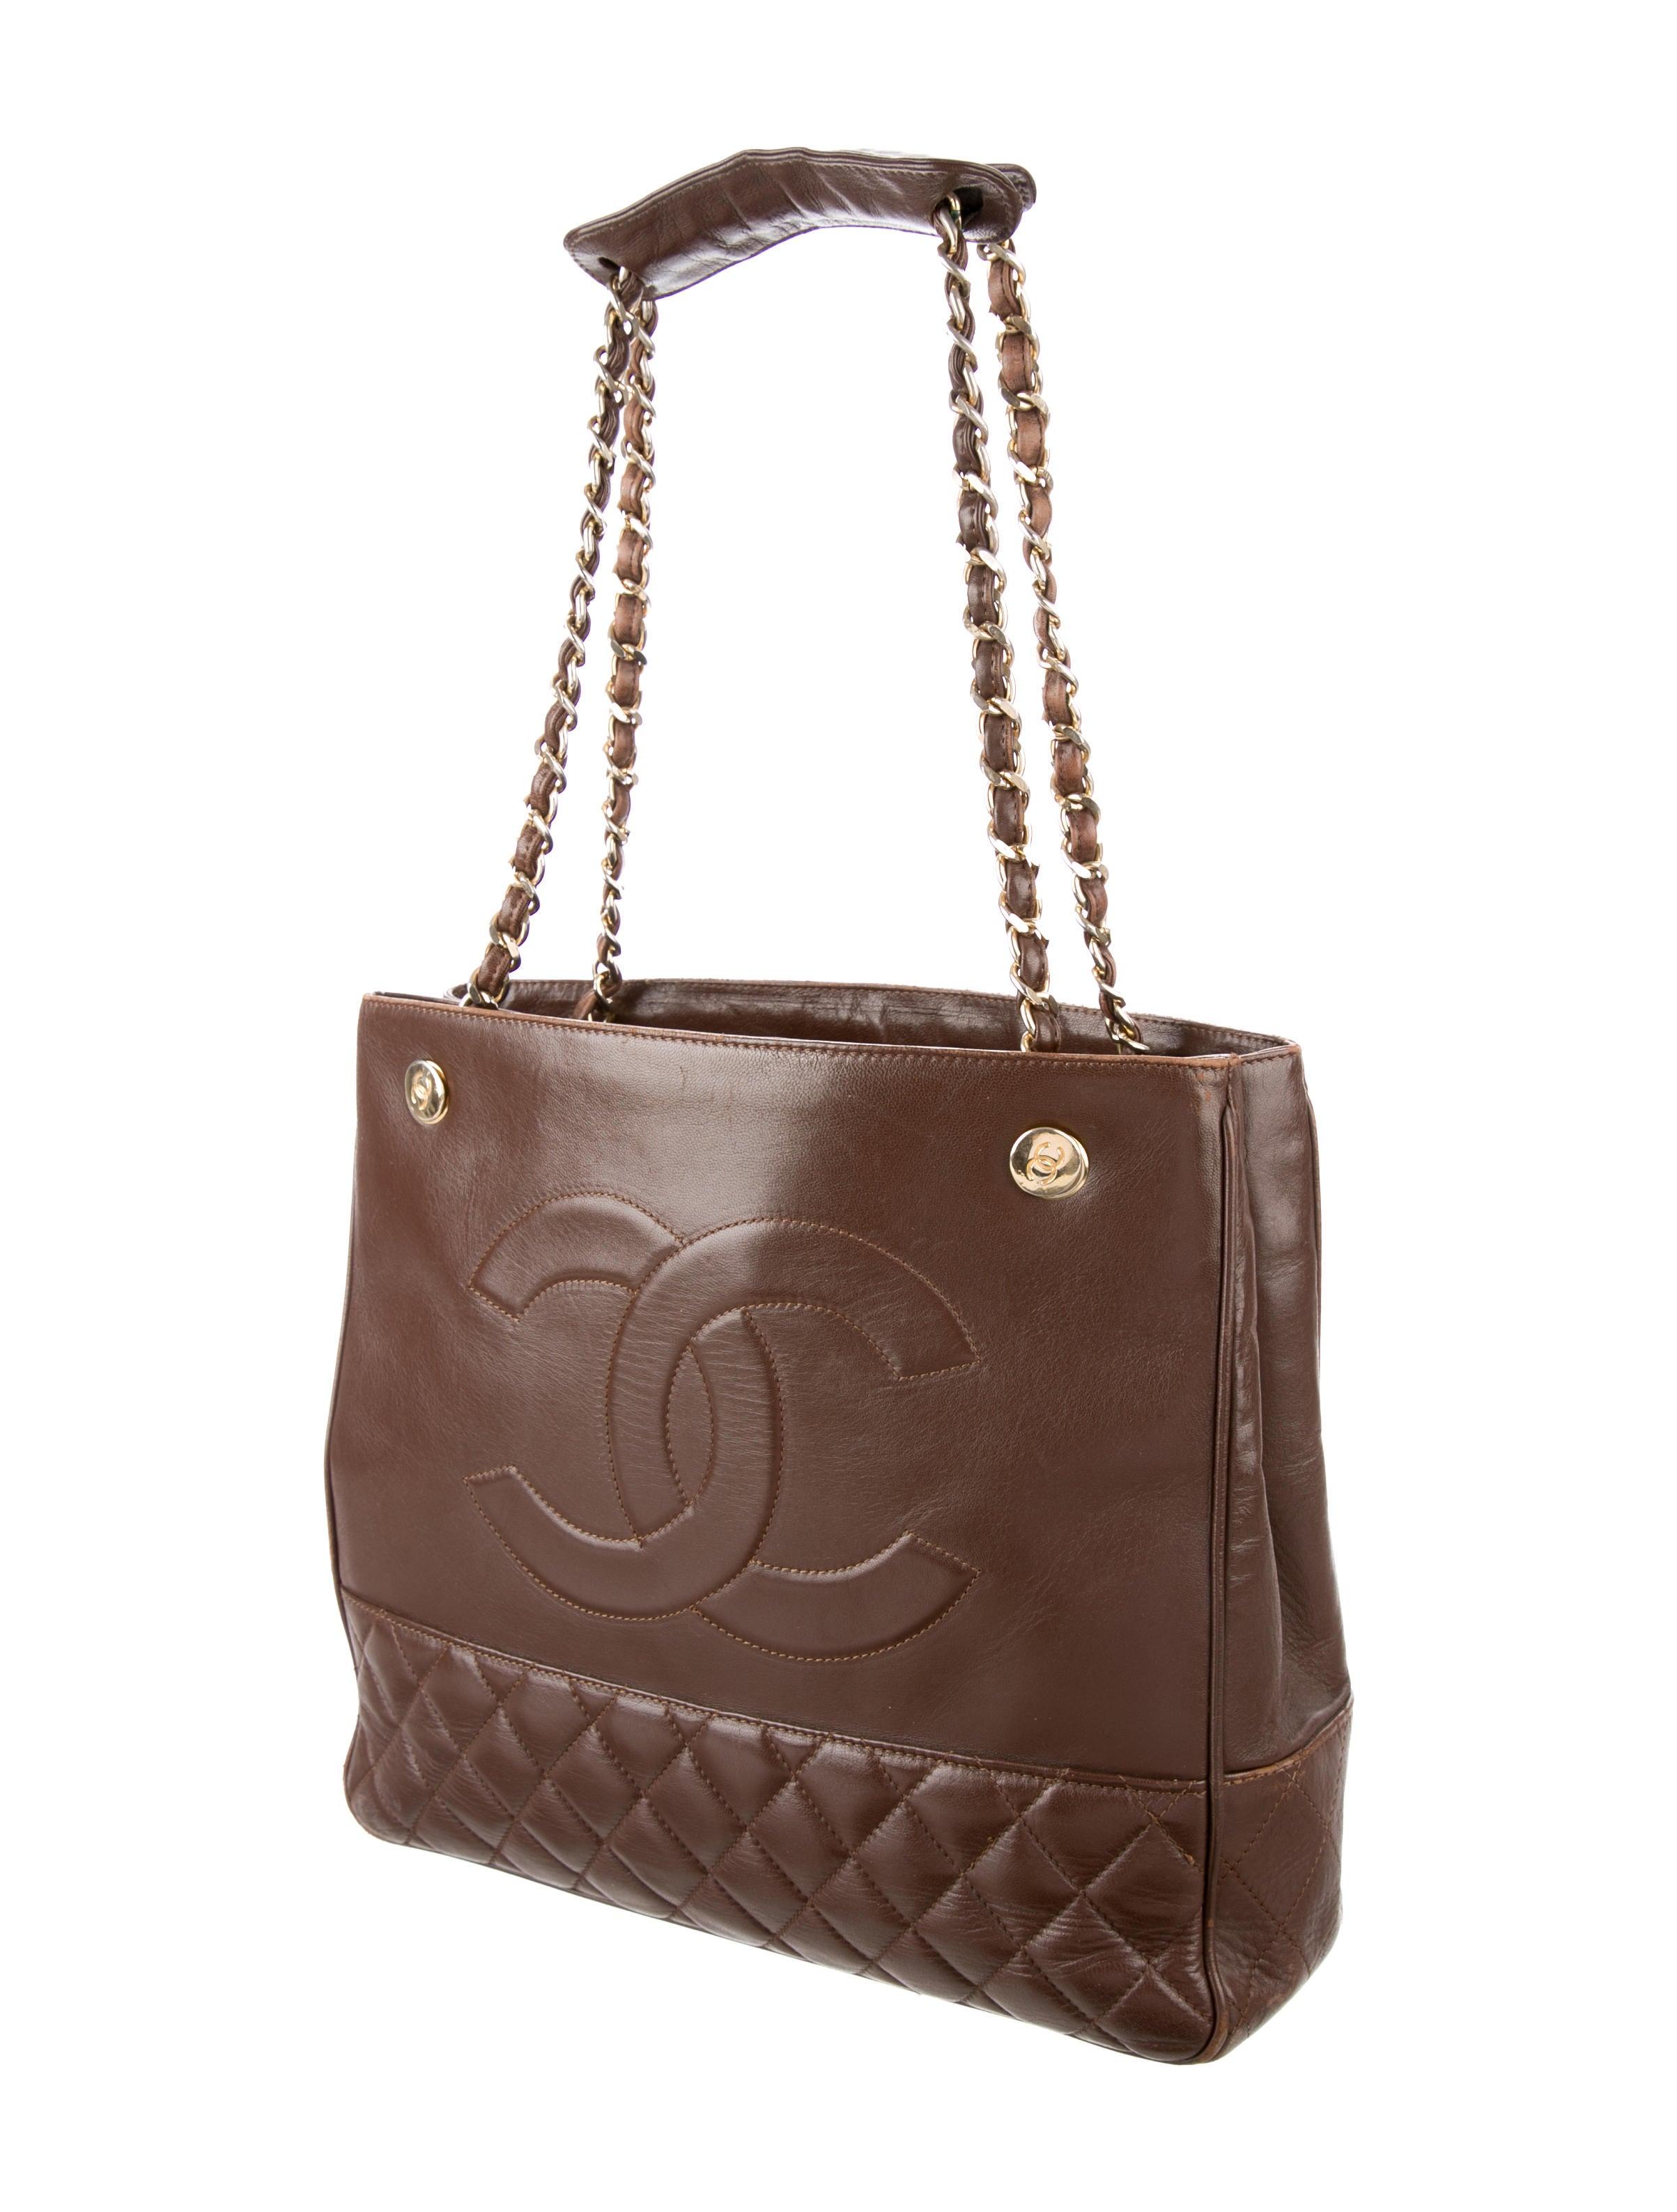 Chanel Lambskin Vintage Timeless Tote - Handbags ...